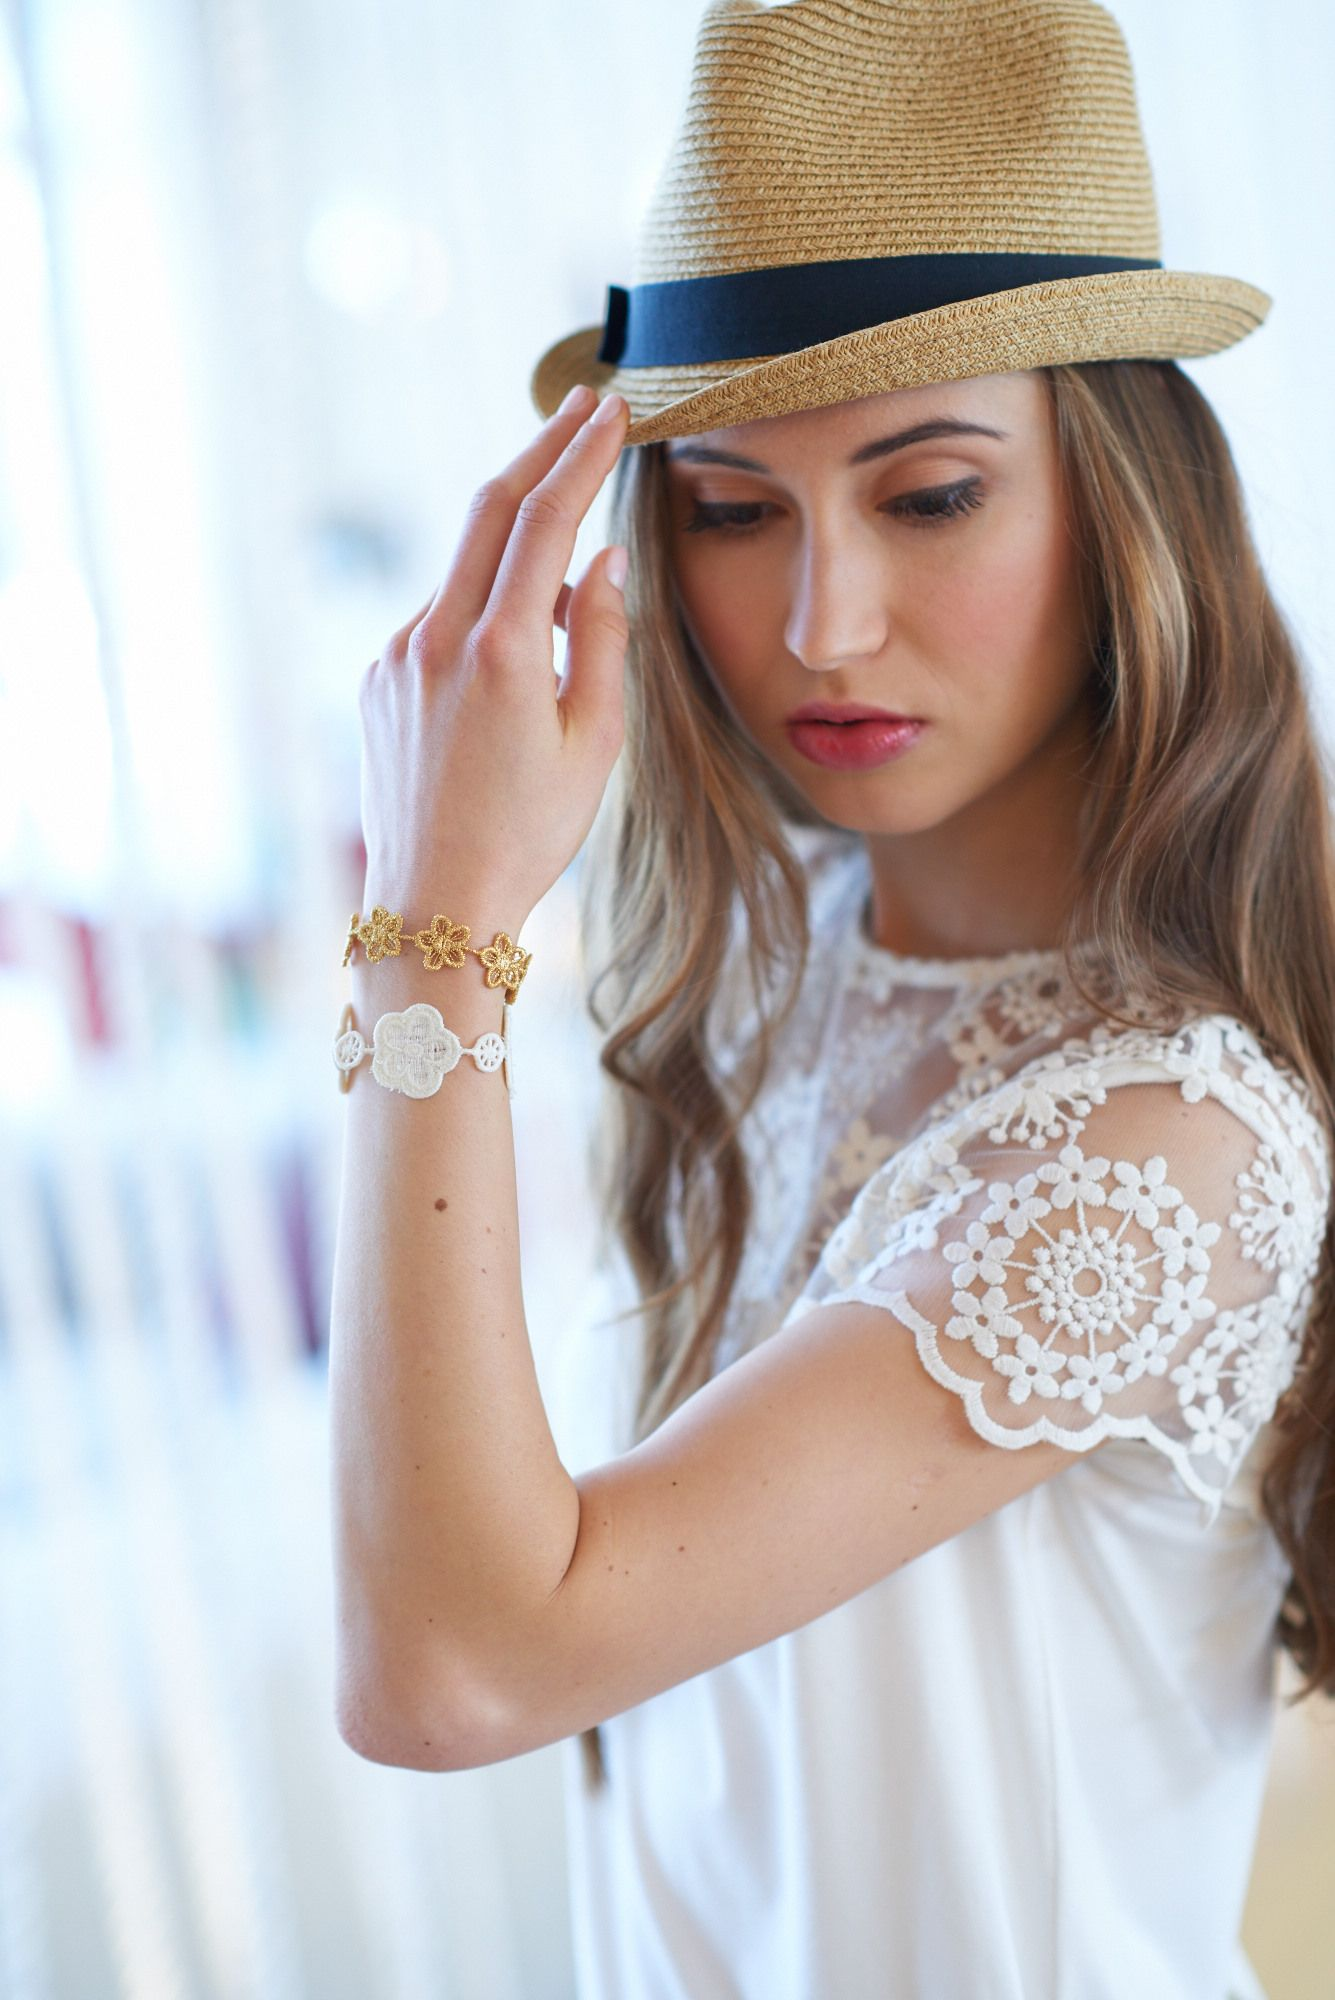 BERNINA Highlight Shirt - Experience - BERNINA | Sewing | Pinterest ...